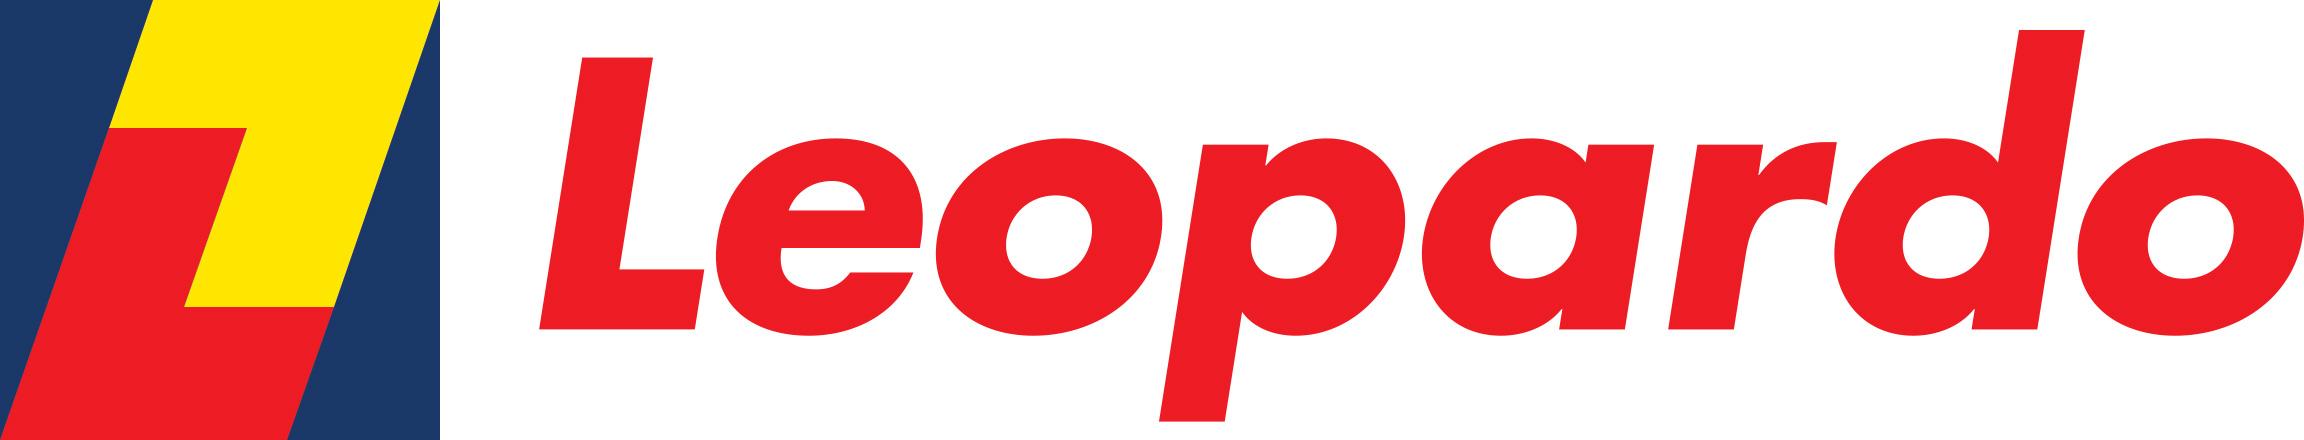 The Leopardo Company Store